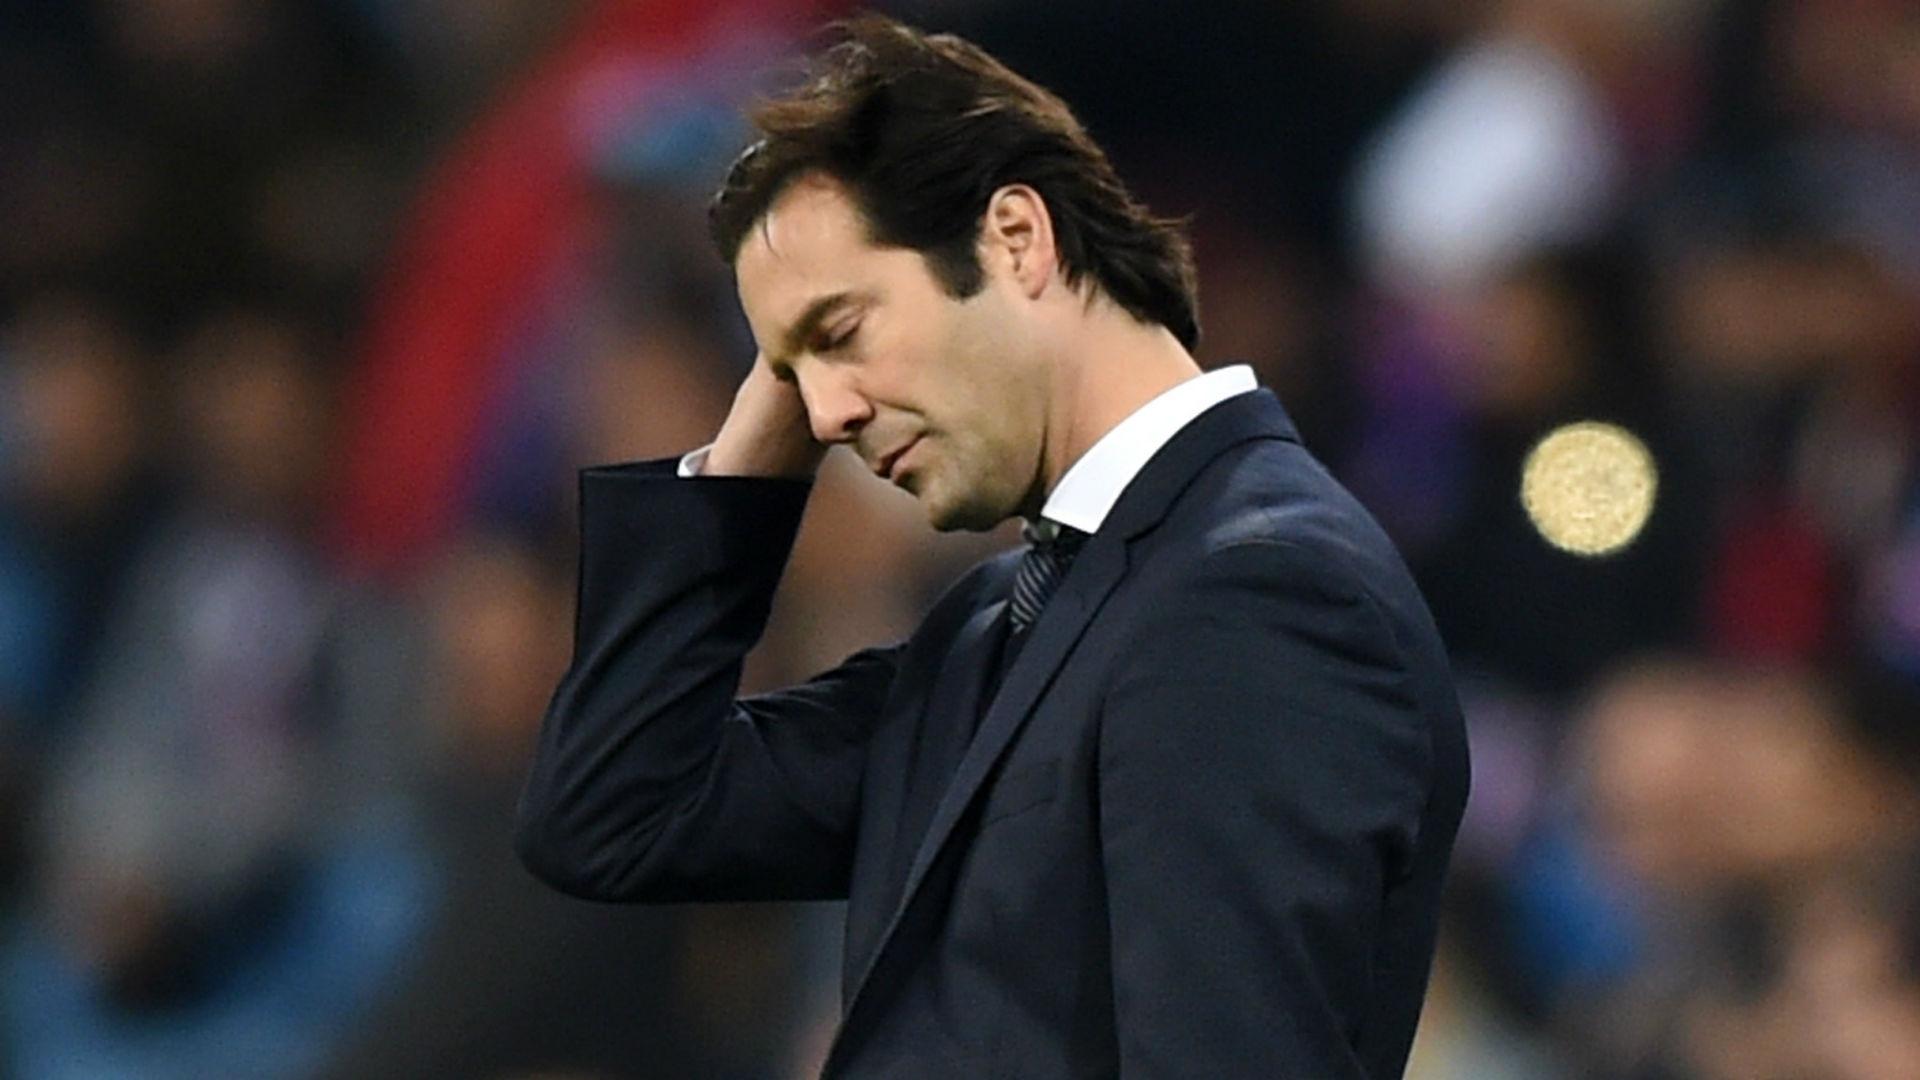 Solari - Real Madrid manager